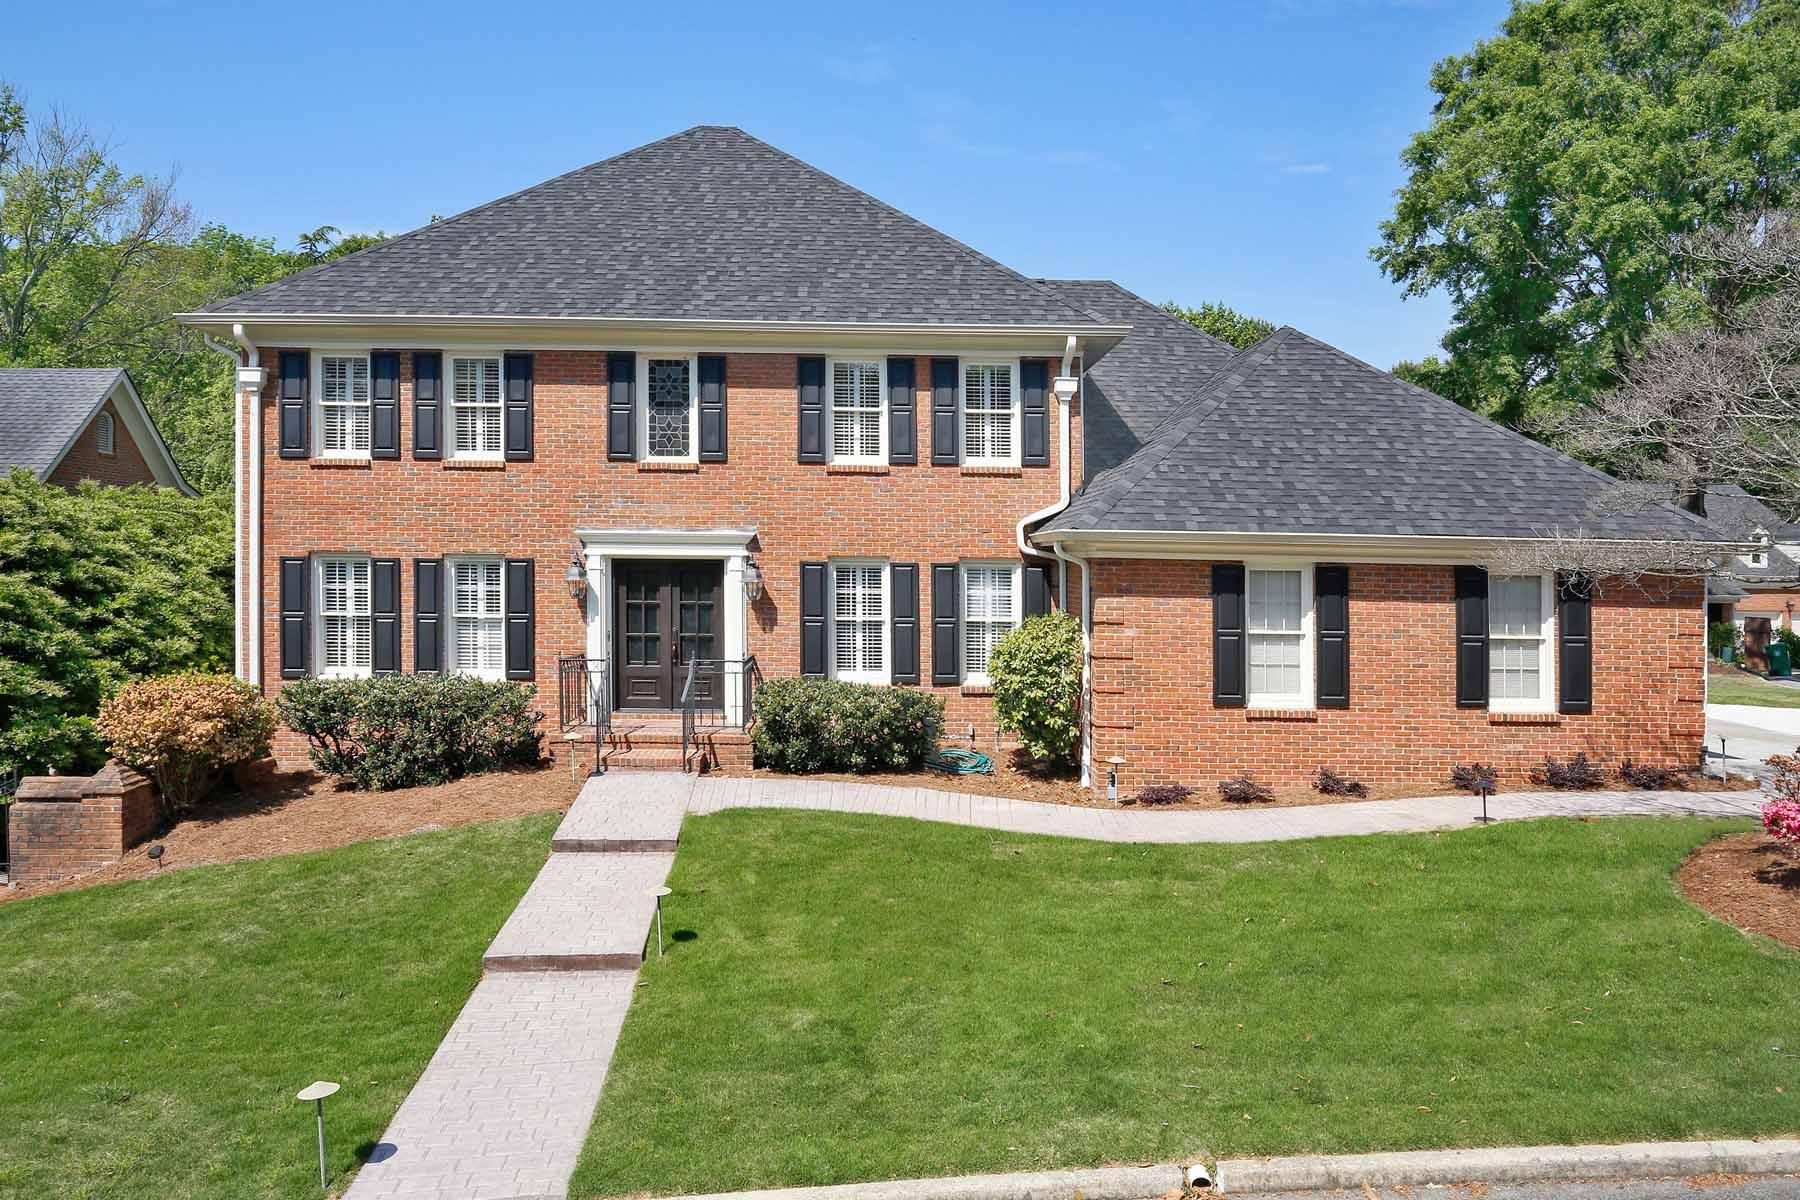 獨棟家庭住宅 為 出售 在 Completely Renovated with Park Like Backyard Intown 1411 Sheridan Walk NE Atlanta, 喬治亞州, 30324 美國